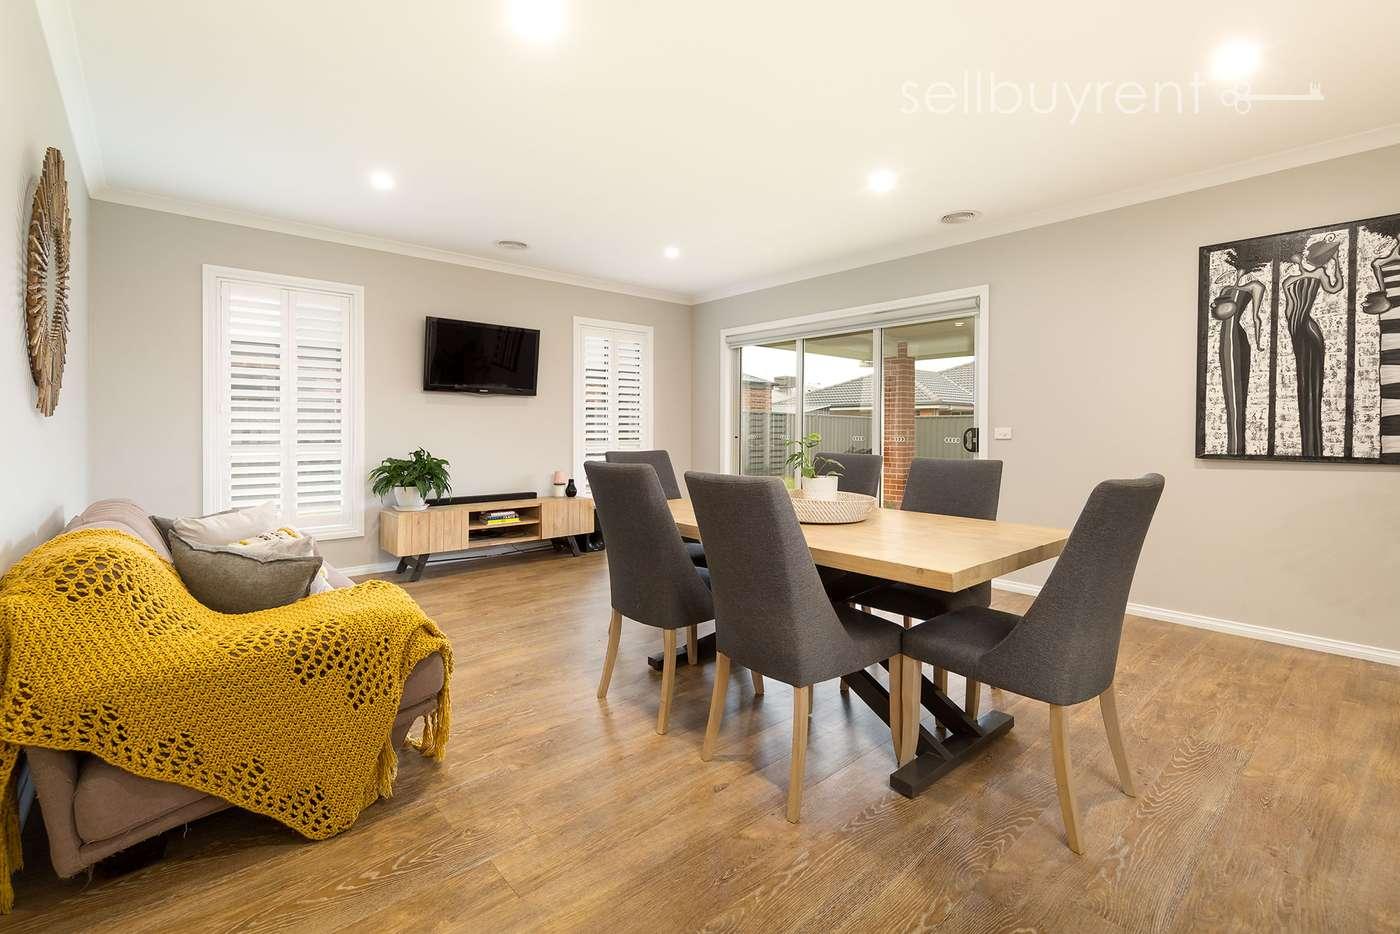 Sixth view of Homely house listing, 18 CALLUS STREET, Killara VIC 3691